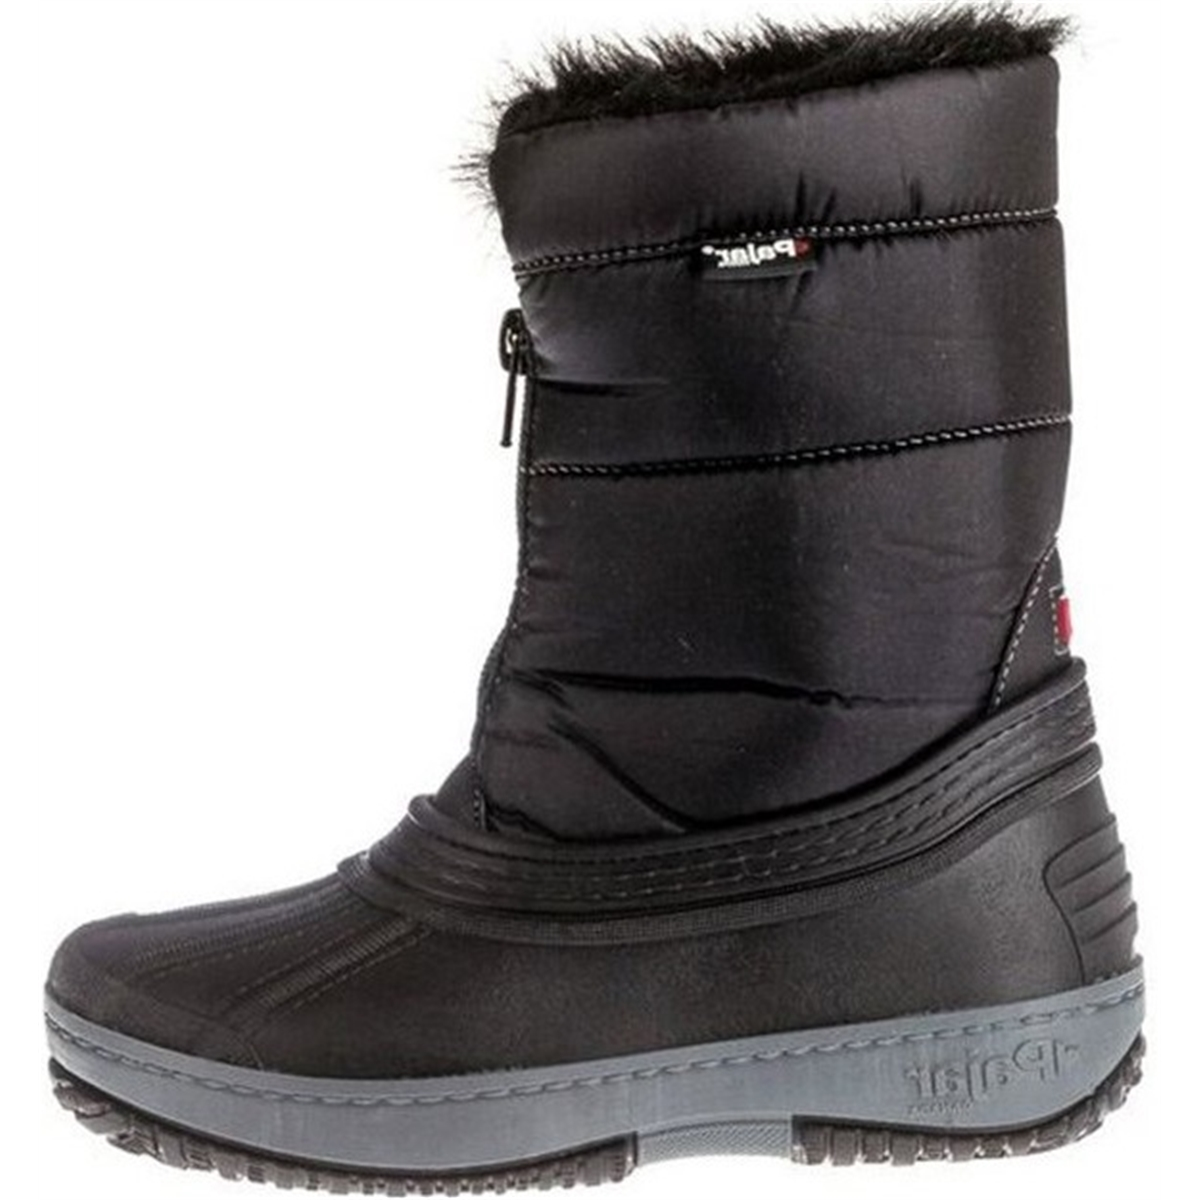 Pajar Boys Alexia Waterproof Snow Boots by Pajar